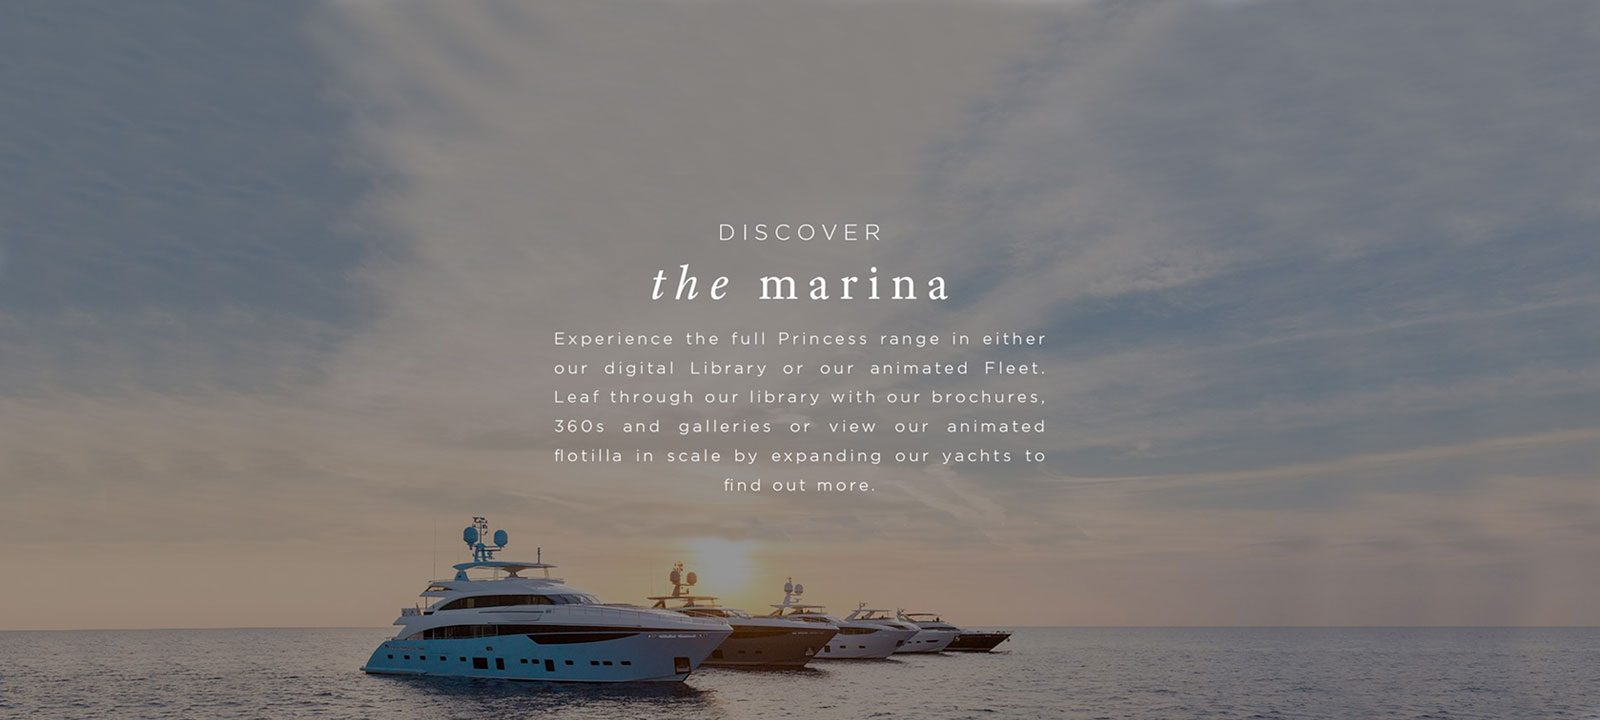 Dicover the marina